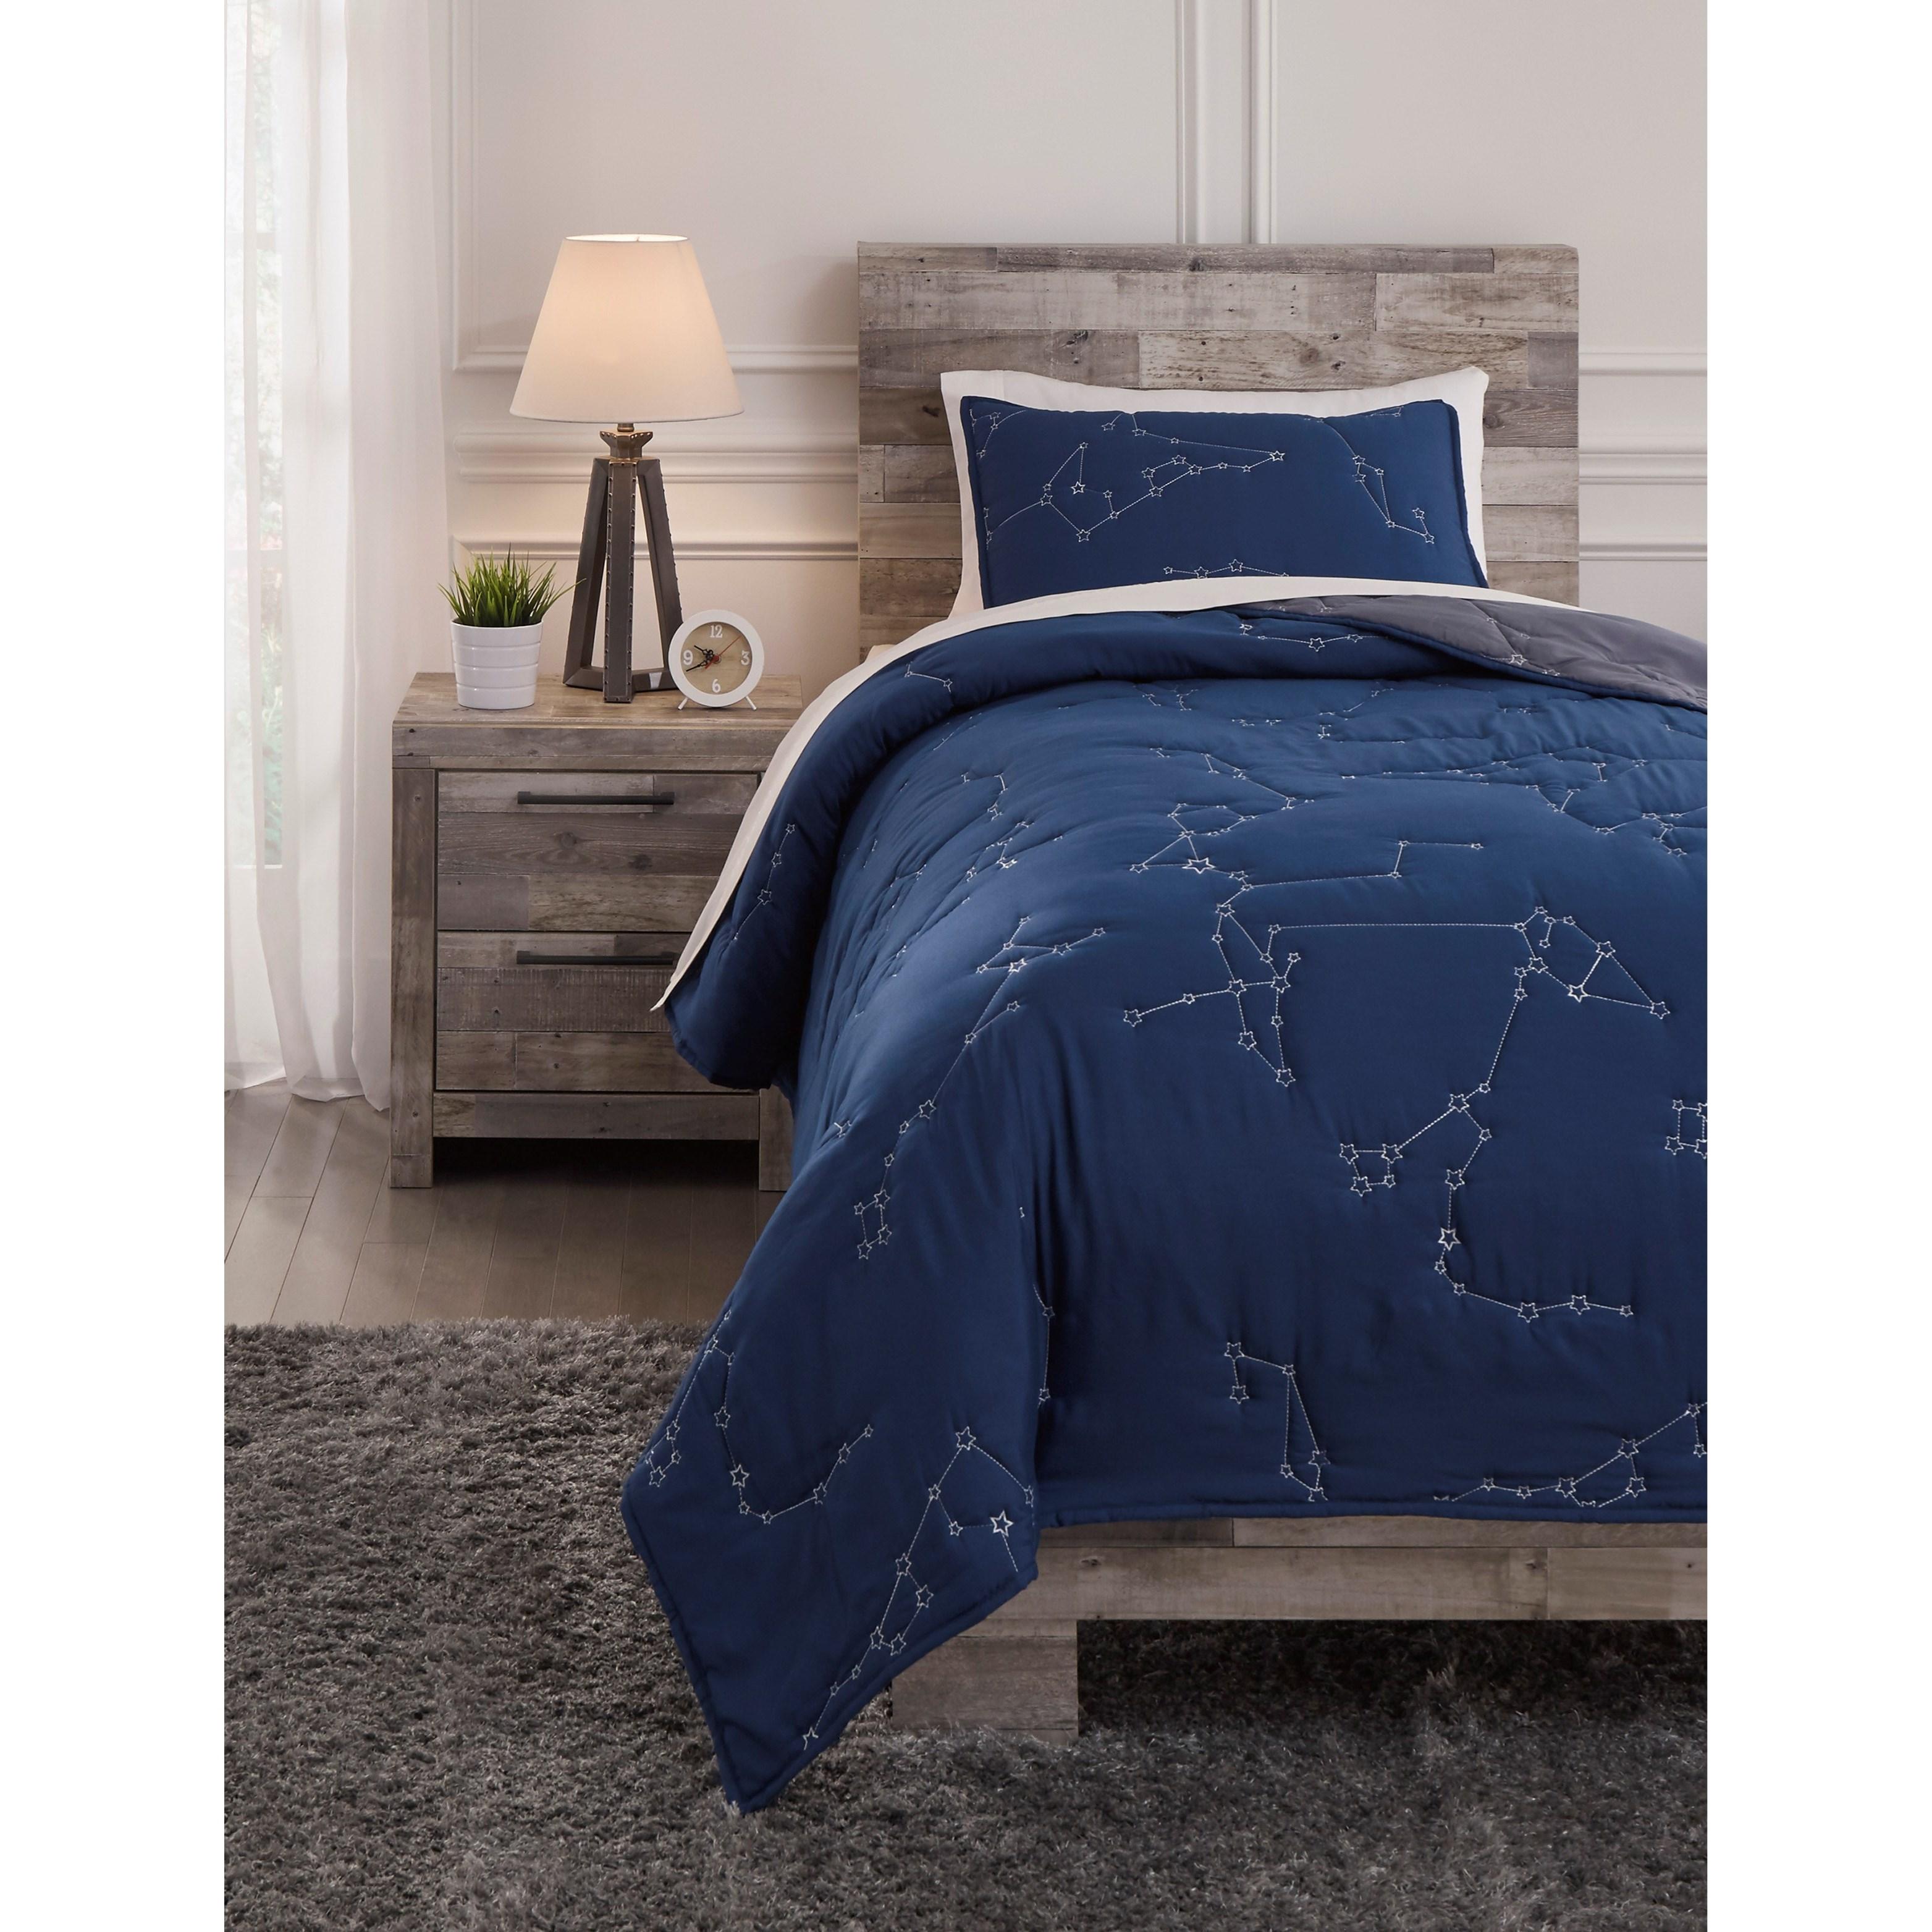 Bedding Sets Ekin Twin Navy/Gray Quilt Set by Ashley (Signature Design) at Johnny Janosik